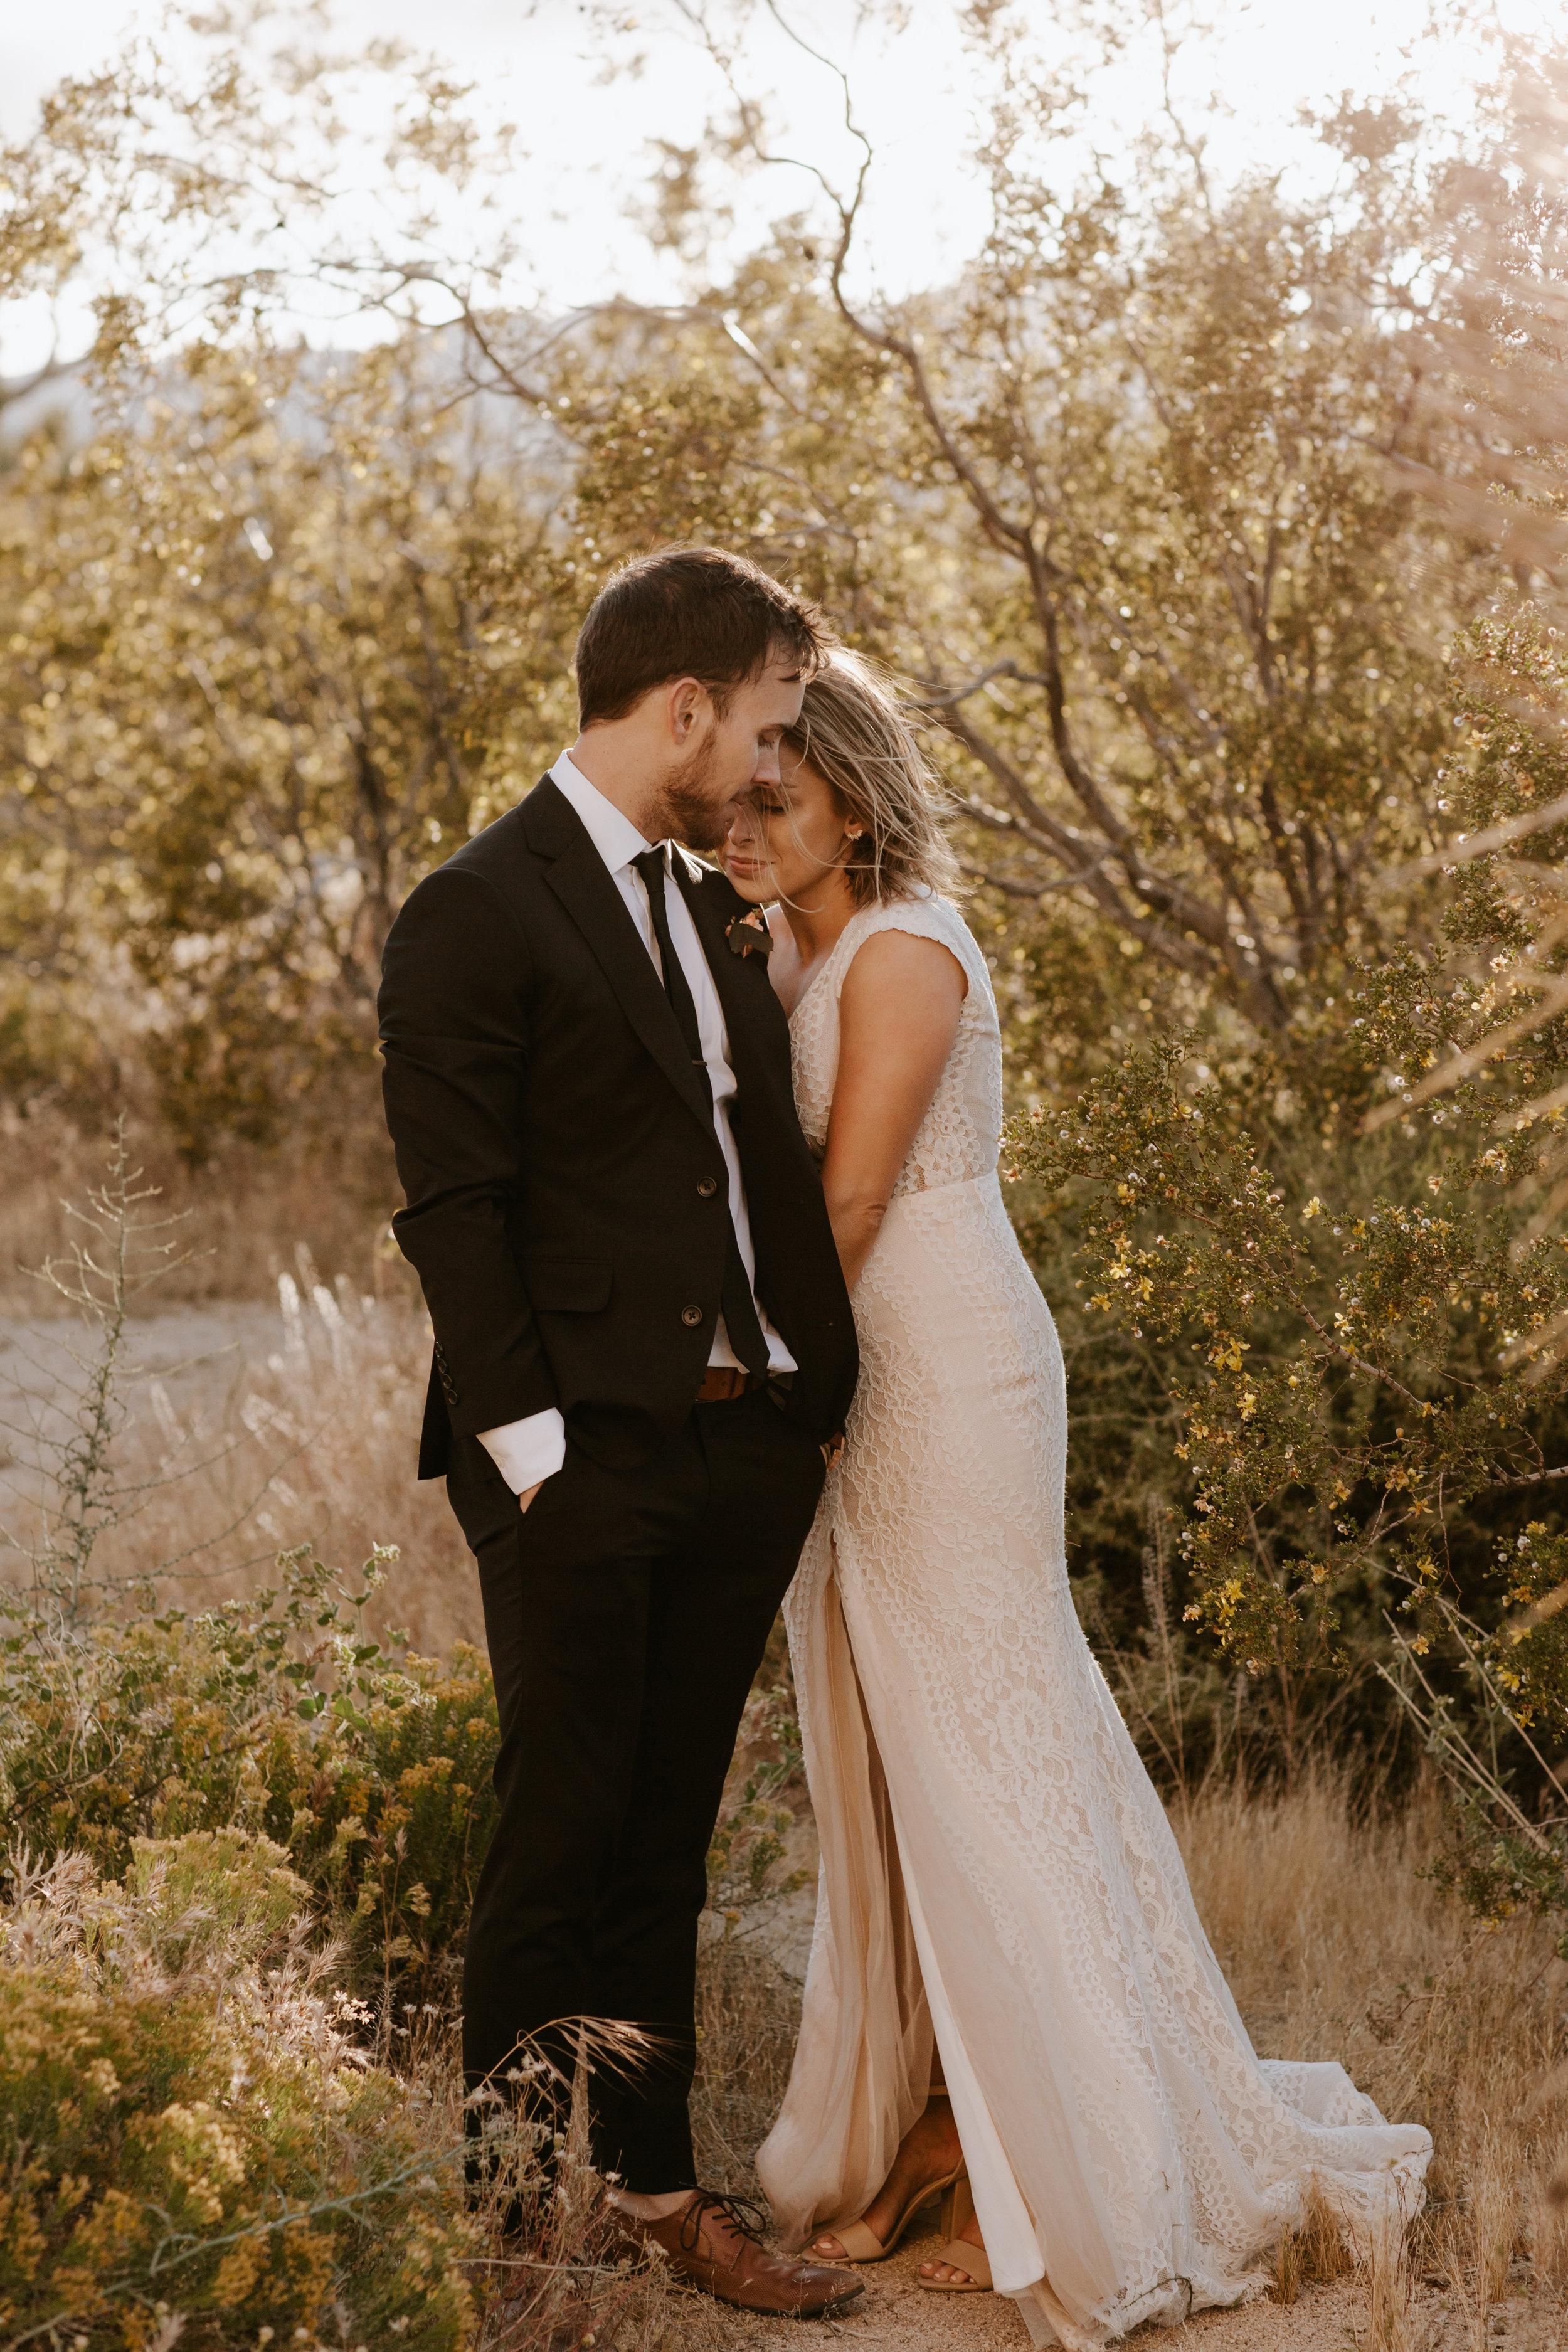 2019-05-26_Callie-Evan_Wedding_Joshua Tree_Paige Nelson_PREVIEWS HR-53.jpg